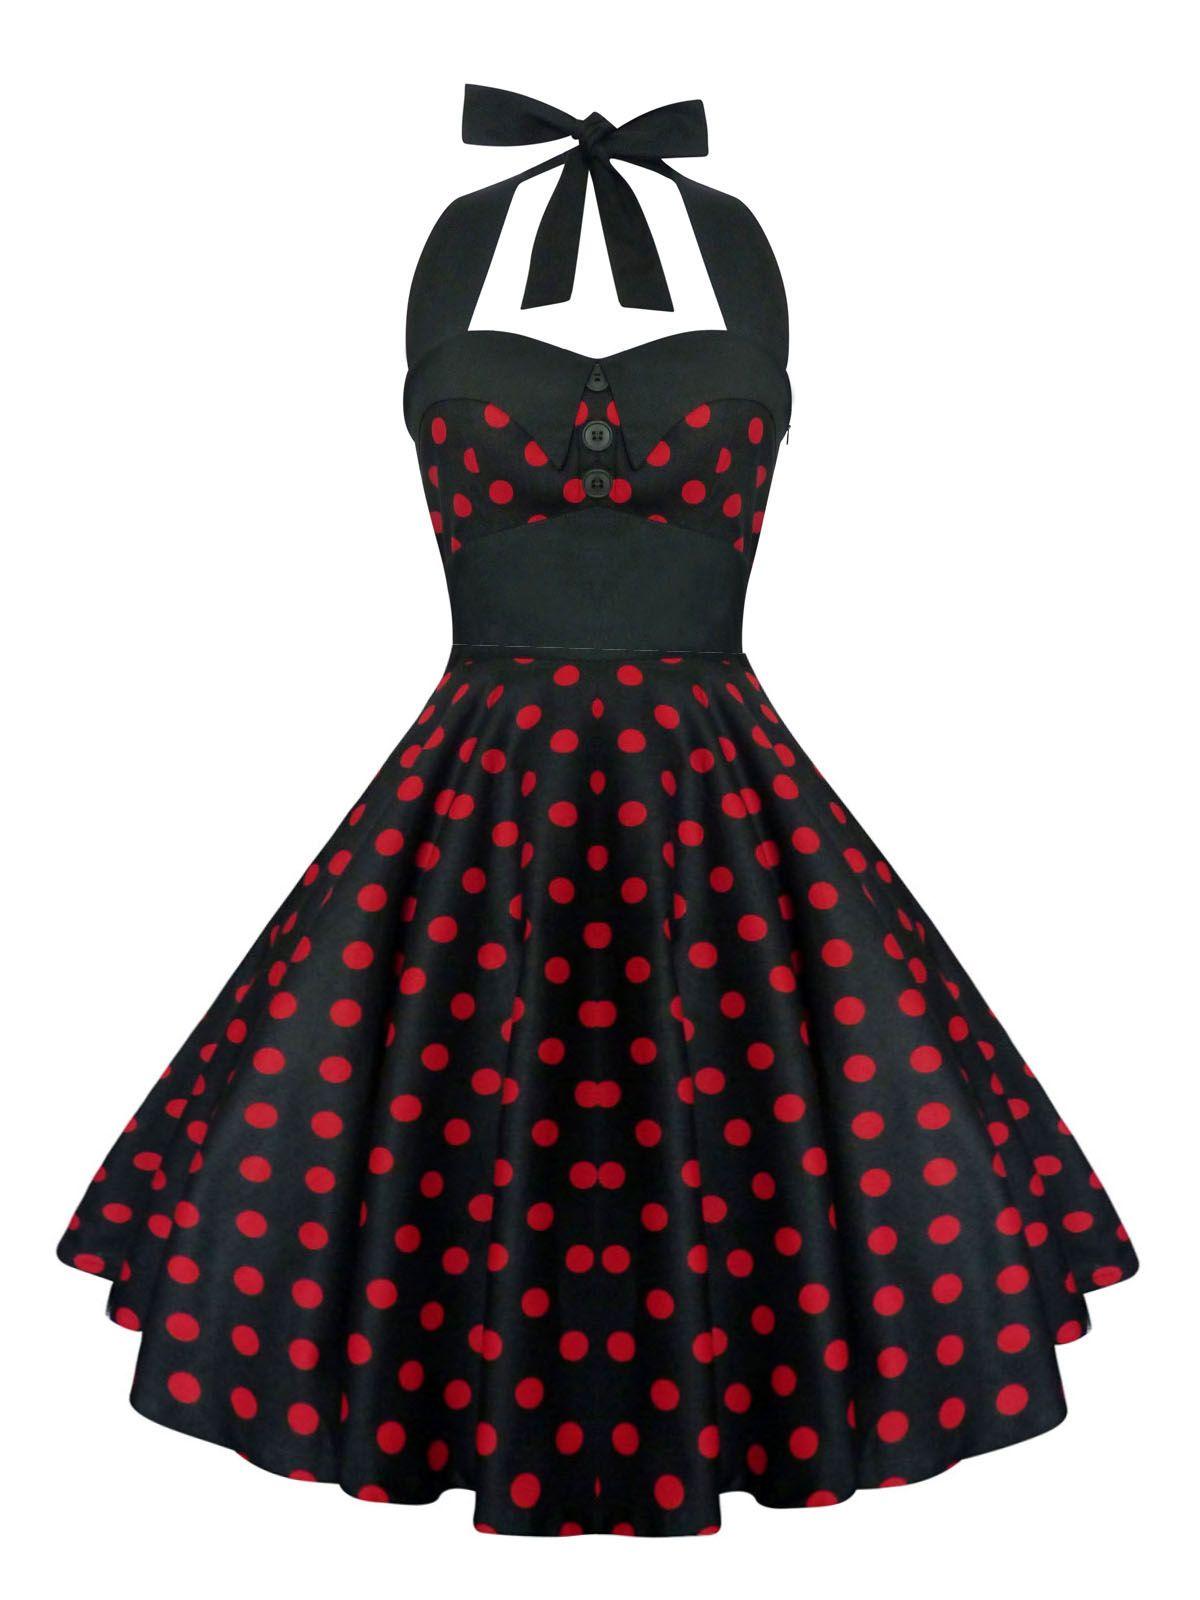 Rockabilly Pin Up Black Red Polka Dot Dress Gothic Halloween Retro